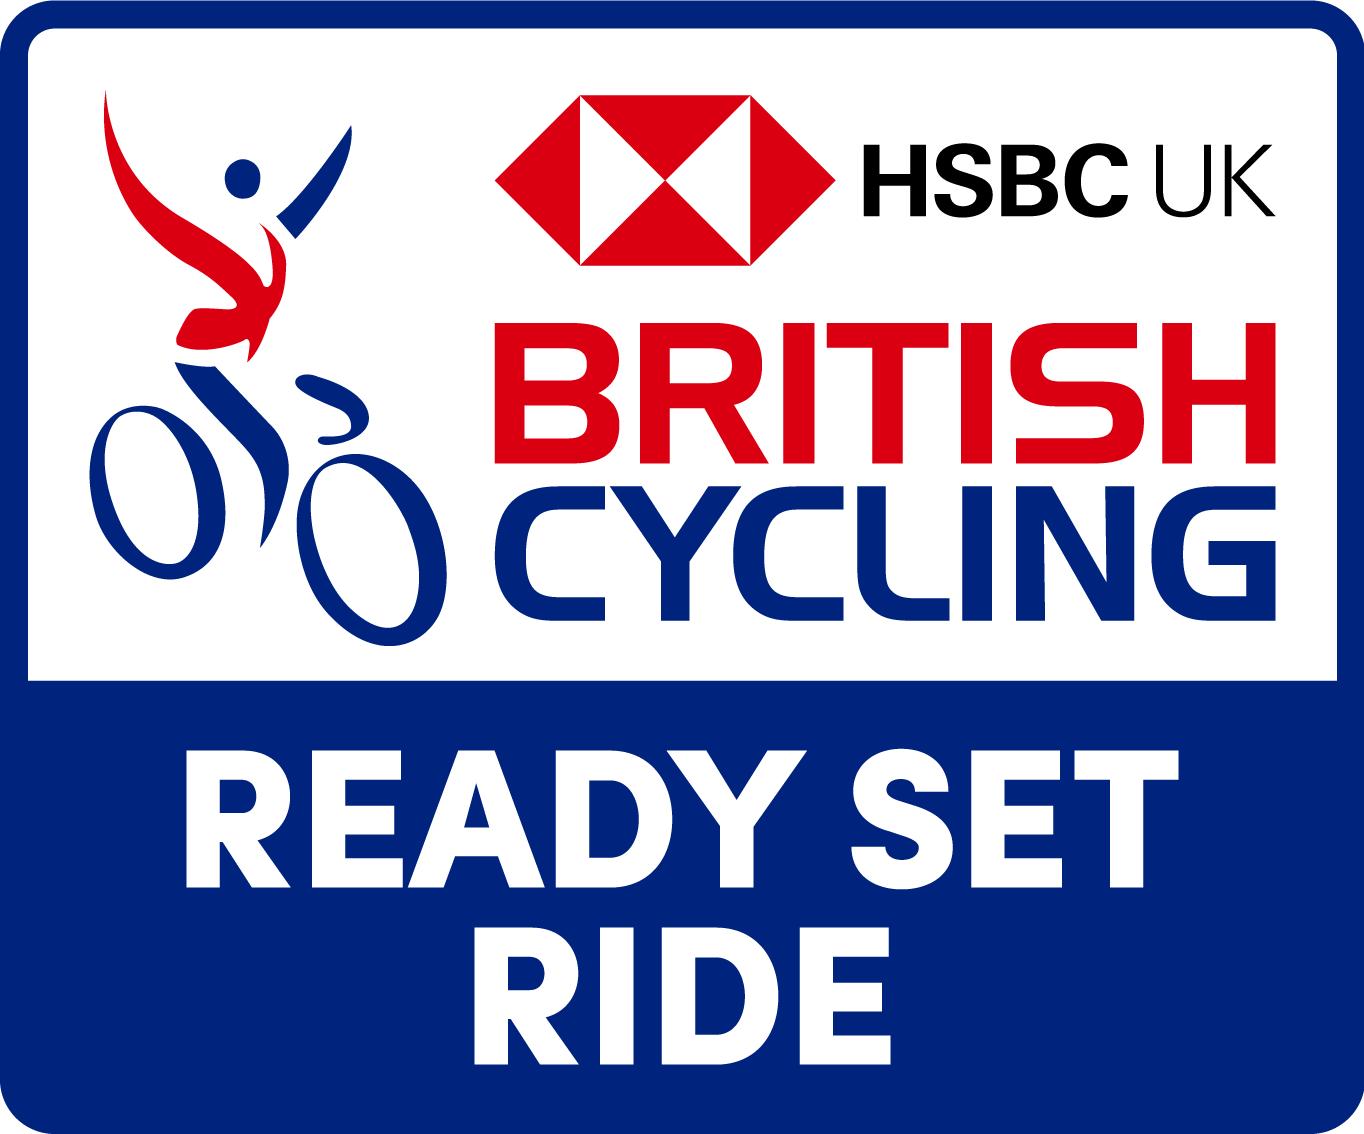 HSBC UK Ready Set Ride